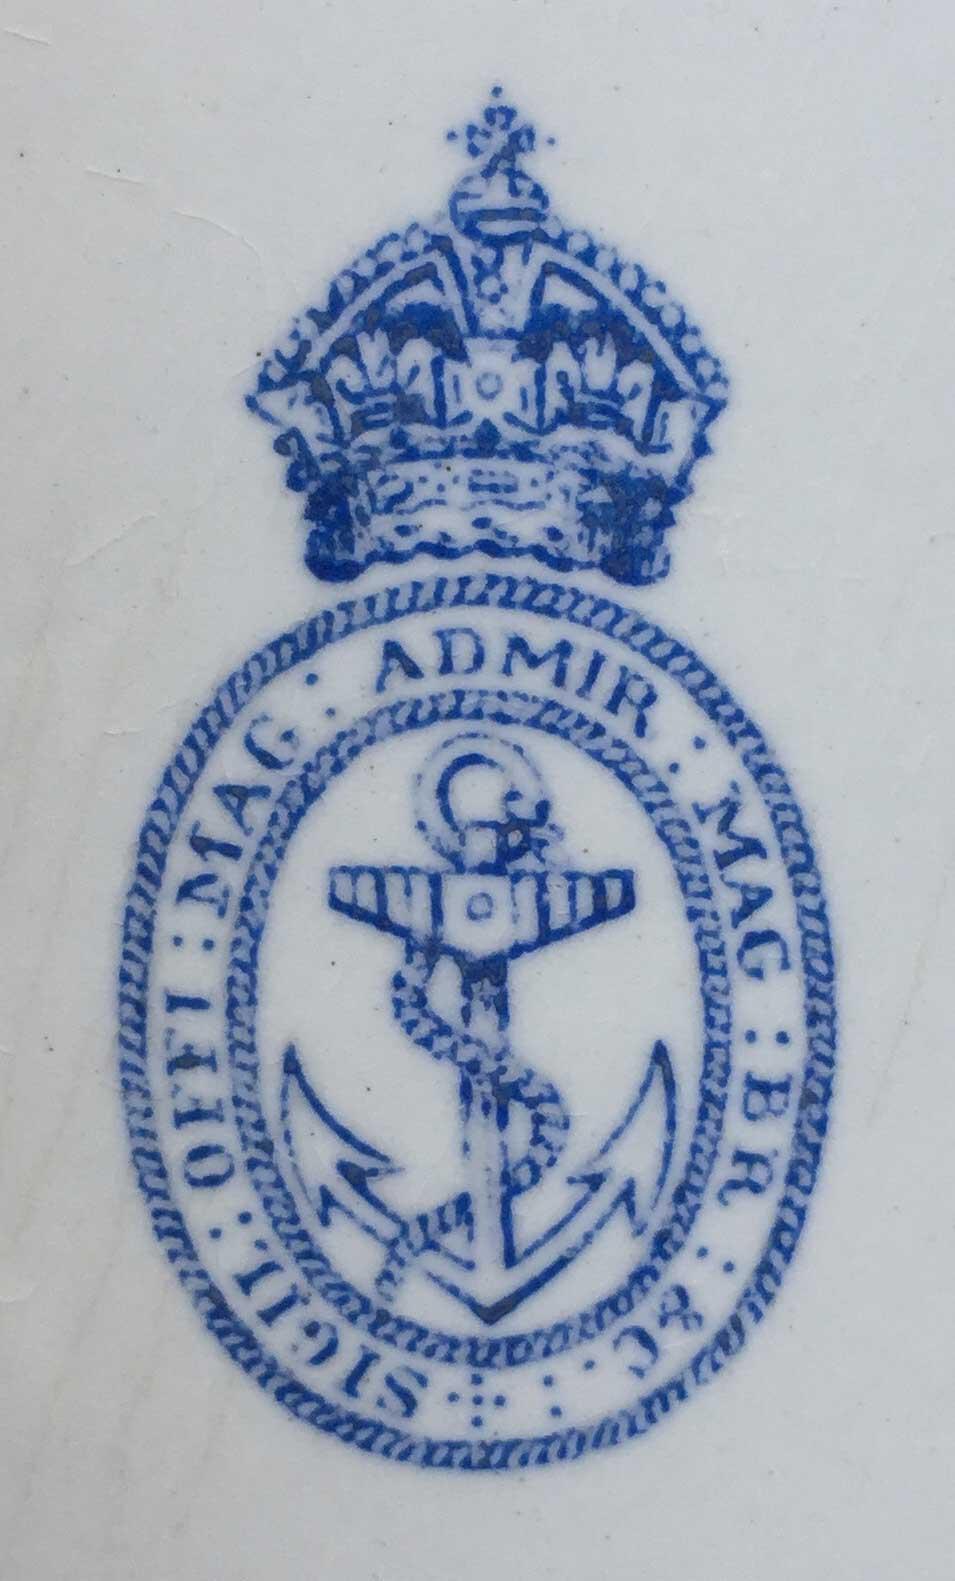 Admiralty emblem.